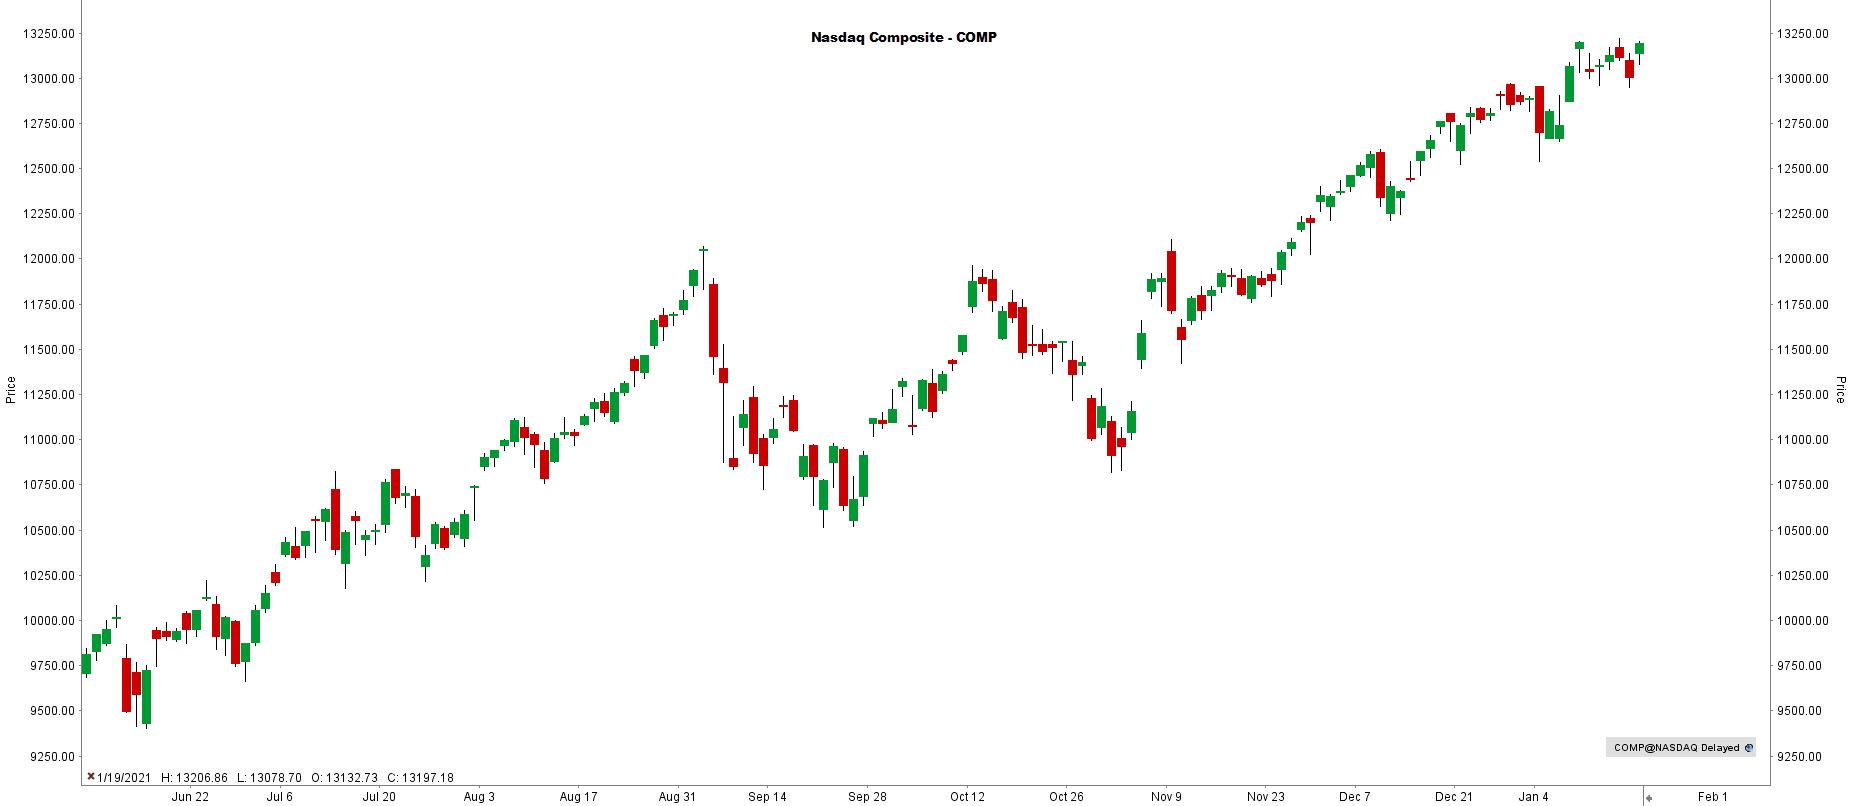 la chronique lynx broker 200121 - graphique NASDAQ